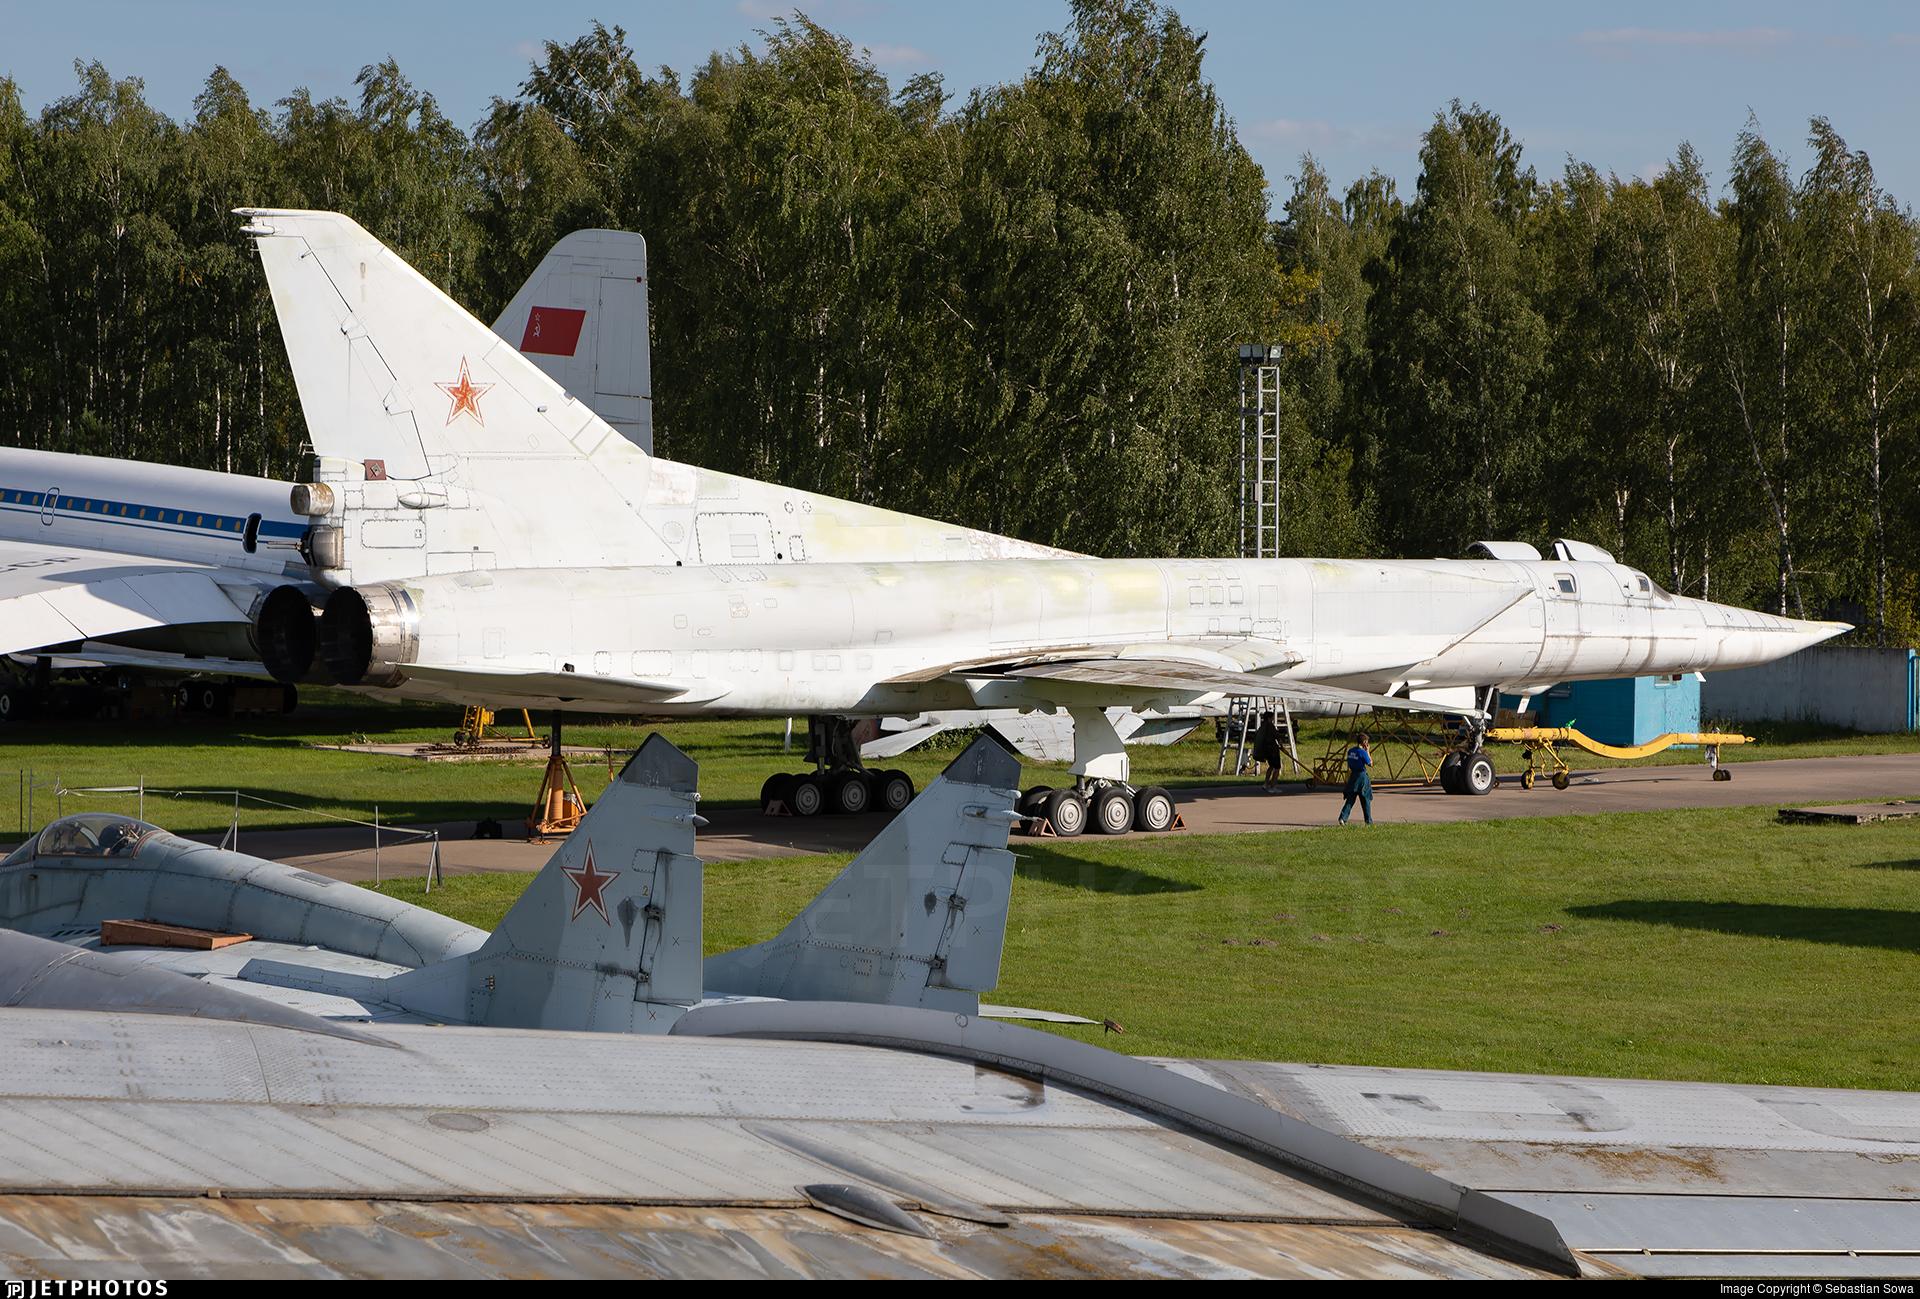 33 - Tupolev Tu-22M3 Backfire - Russia - Air Force